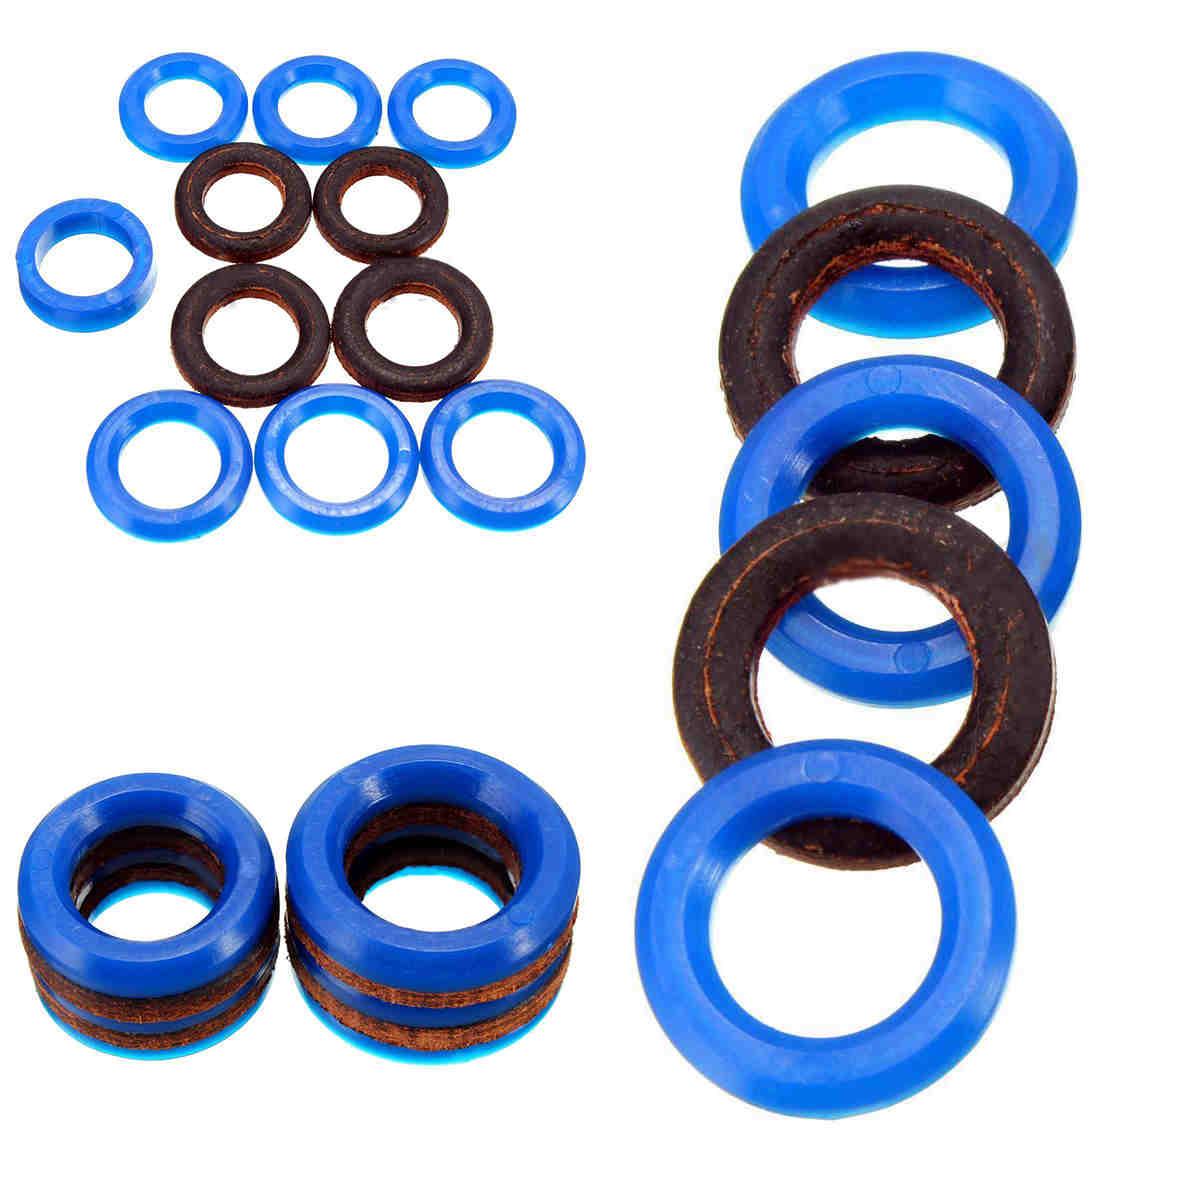 OSSIEAO 11Pcs Airless Spray Seal Ring Repair Set 244194 For Spraying Machine Blue&Black